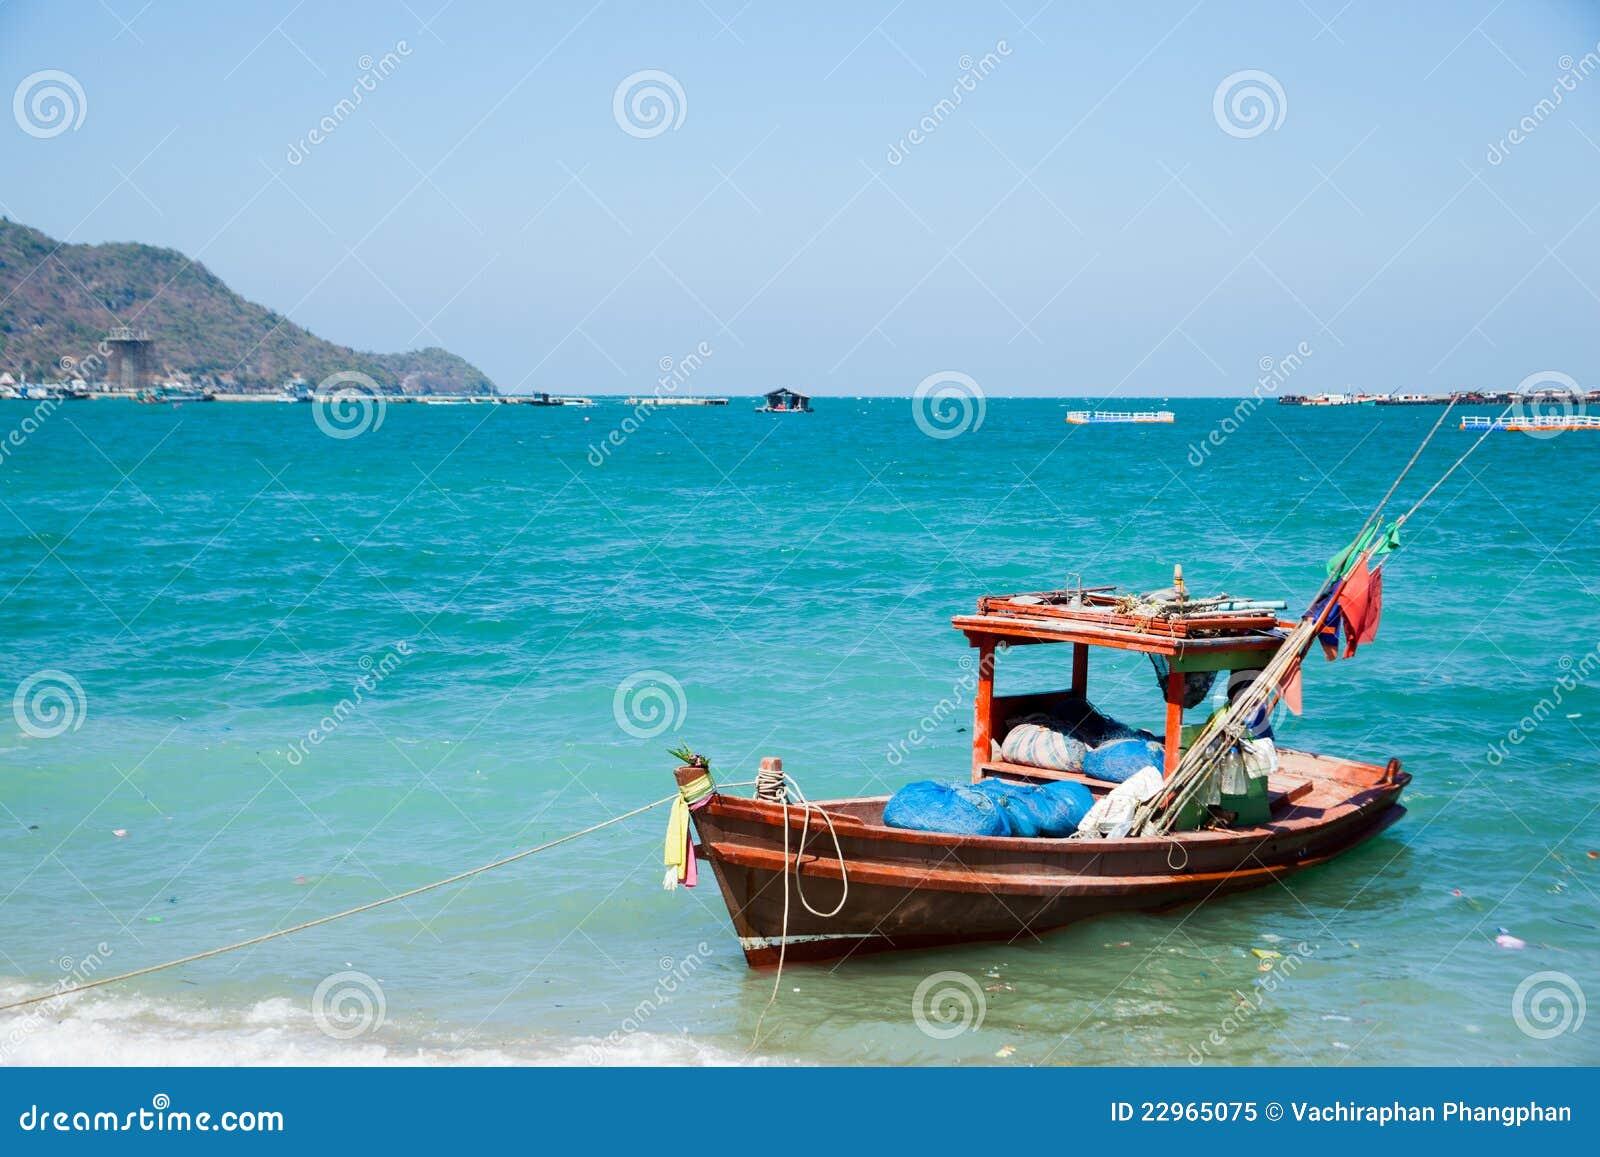 Fishing boat royalty free stock photo image 22965075 for Free fishing boats